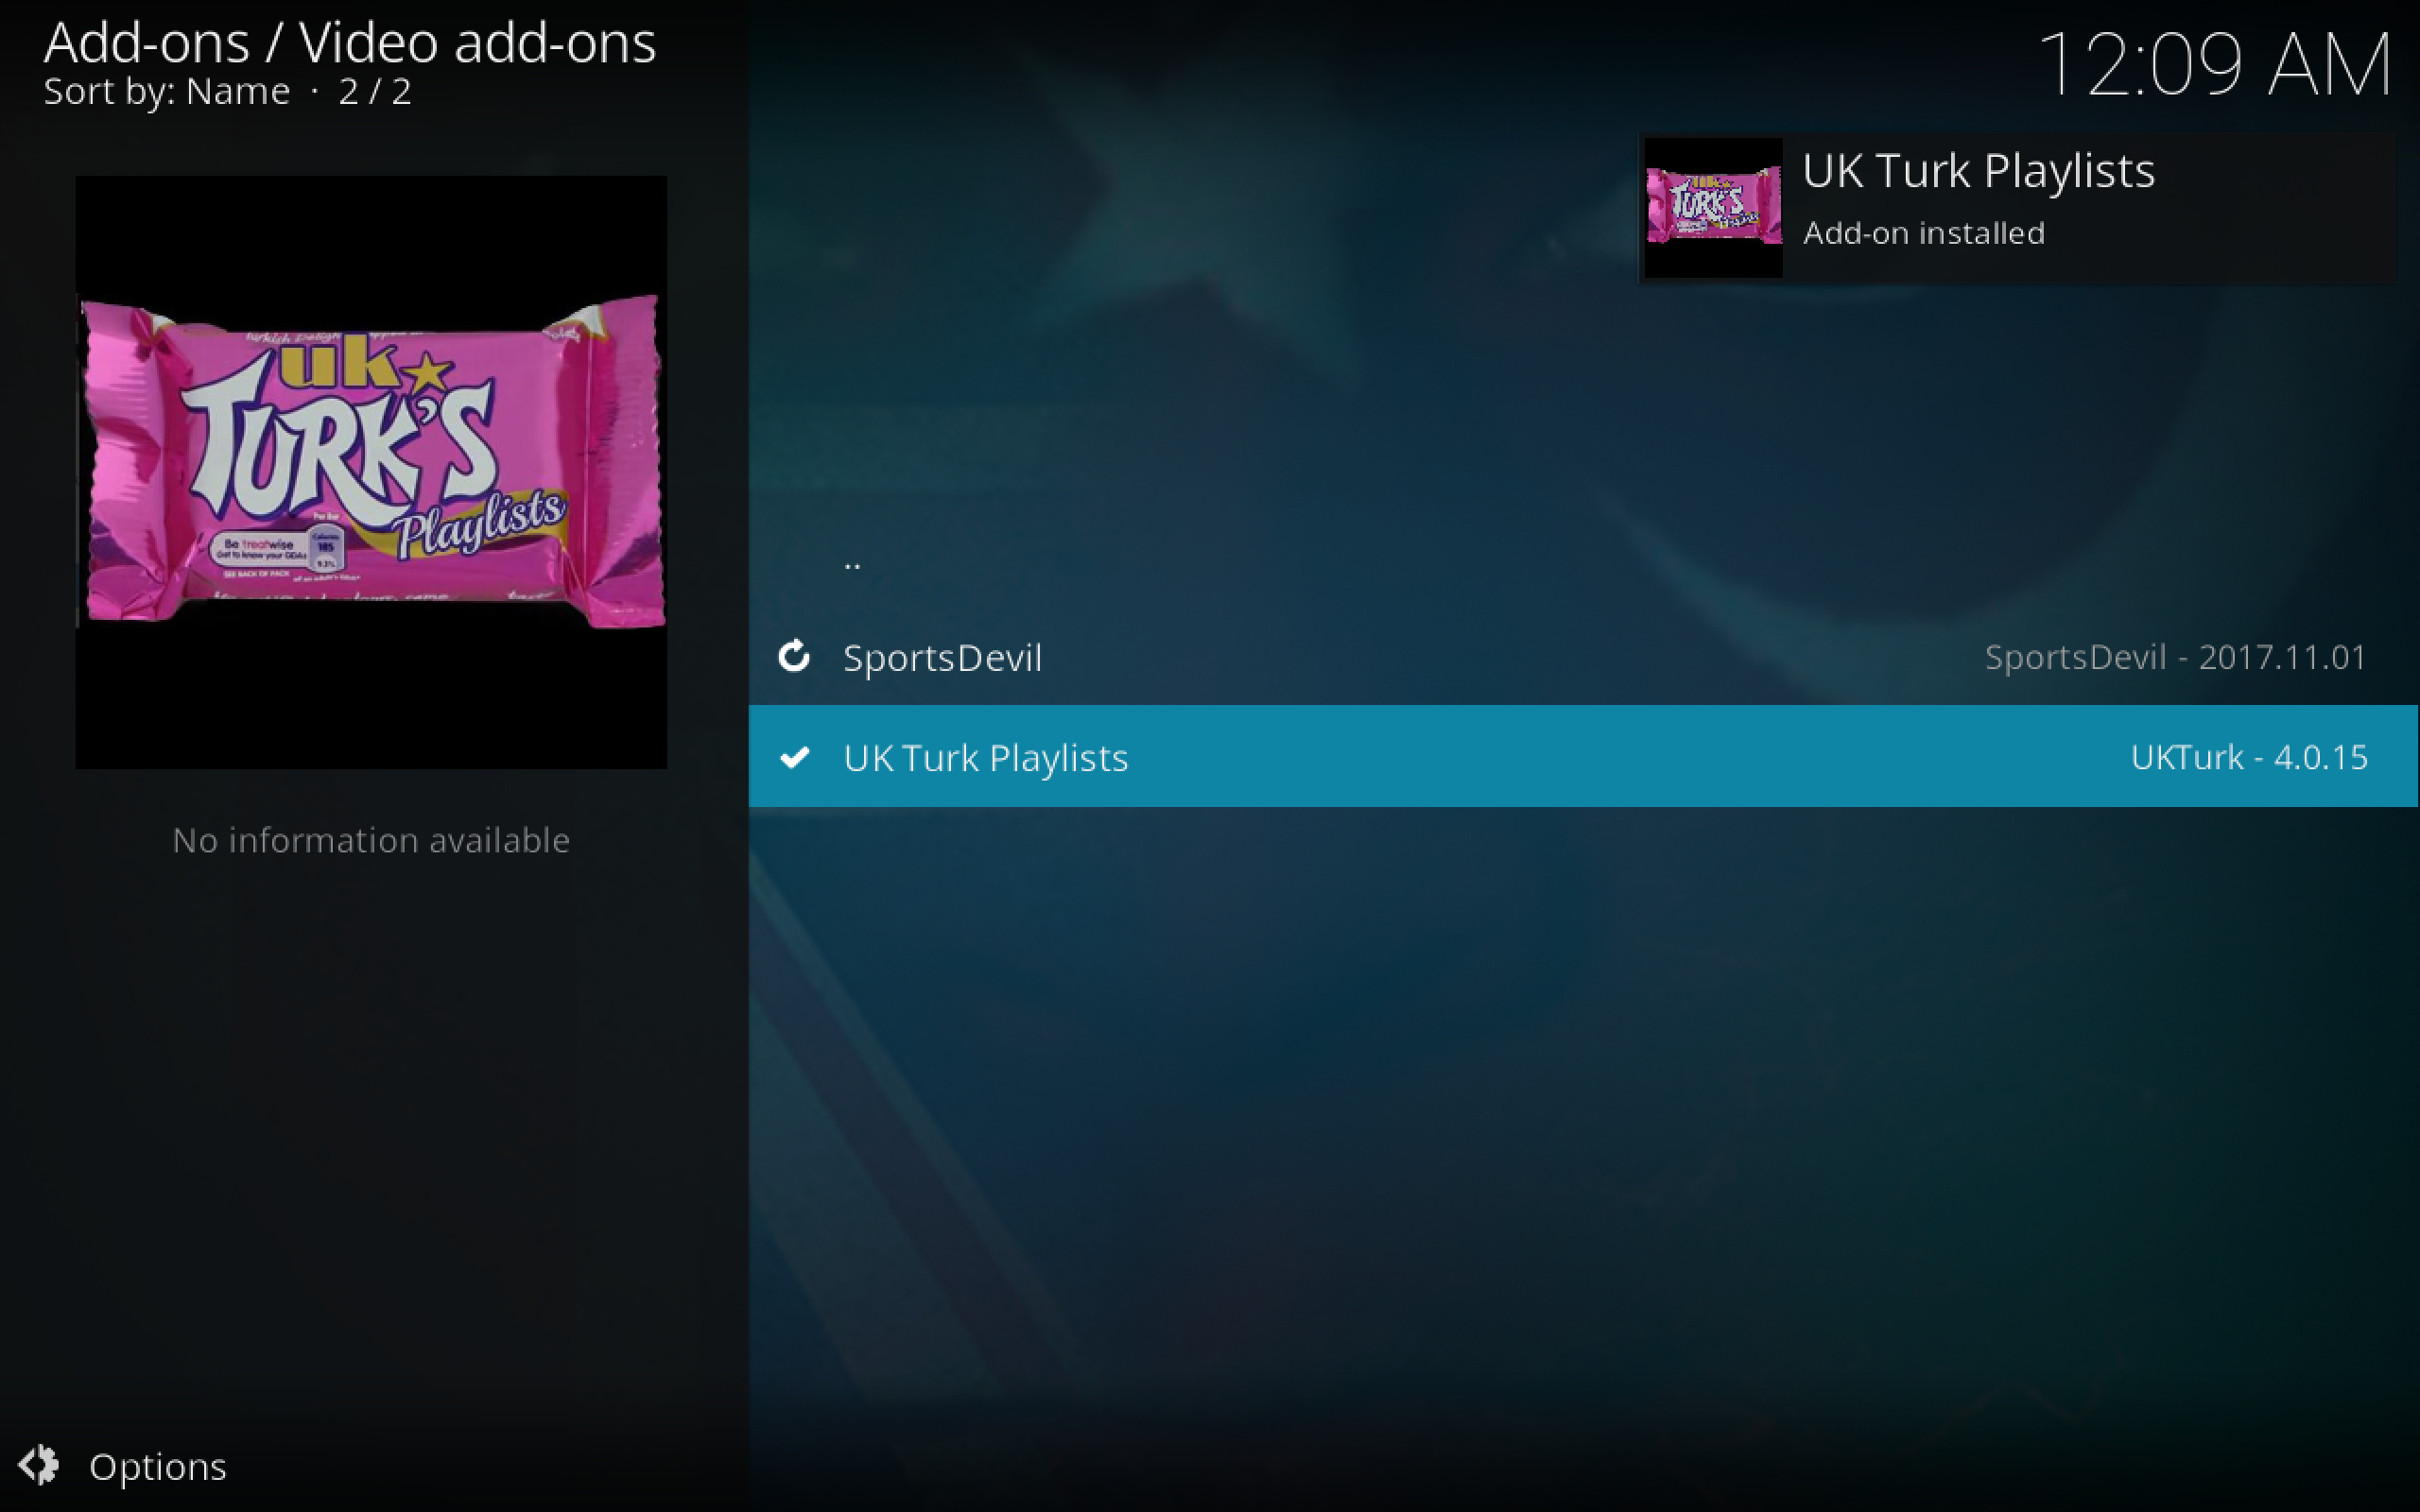 UK Turk Playlists Kodi Add-on Installed